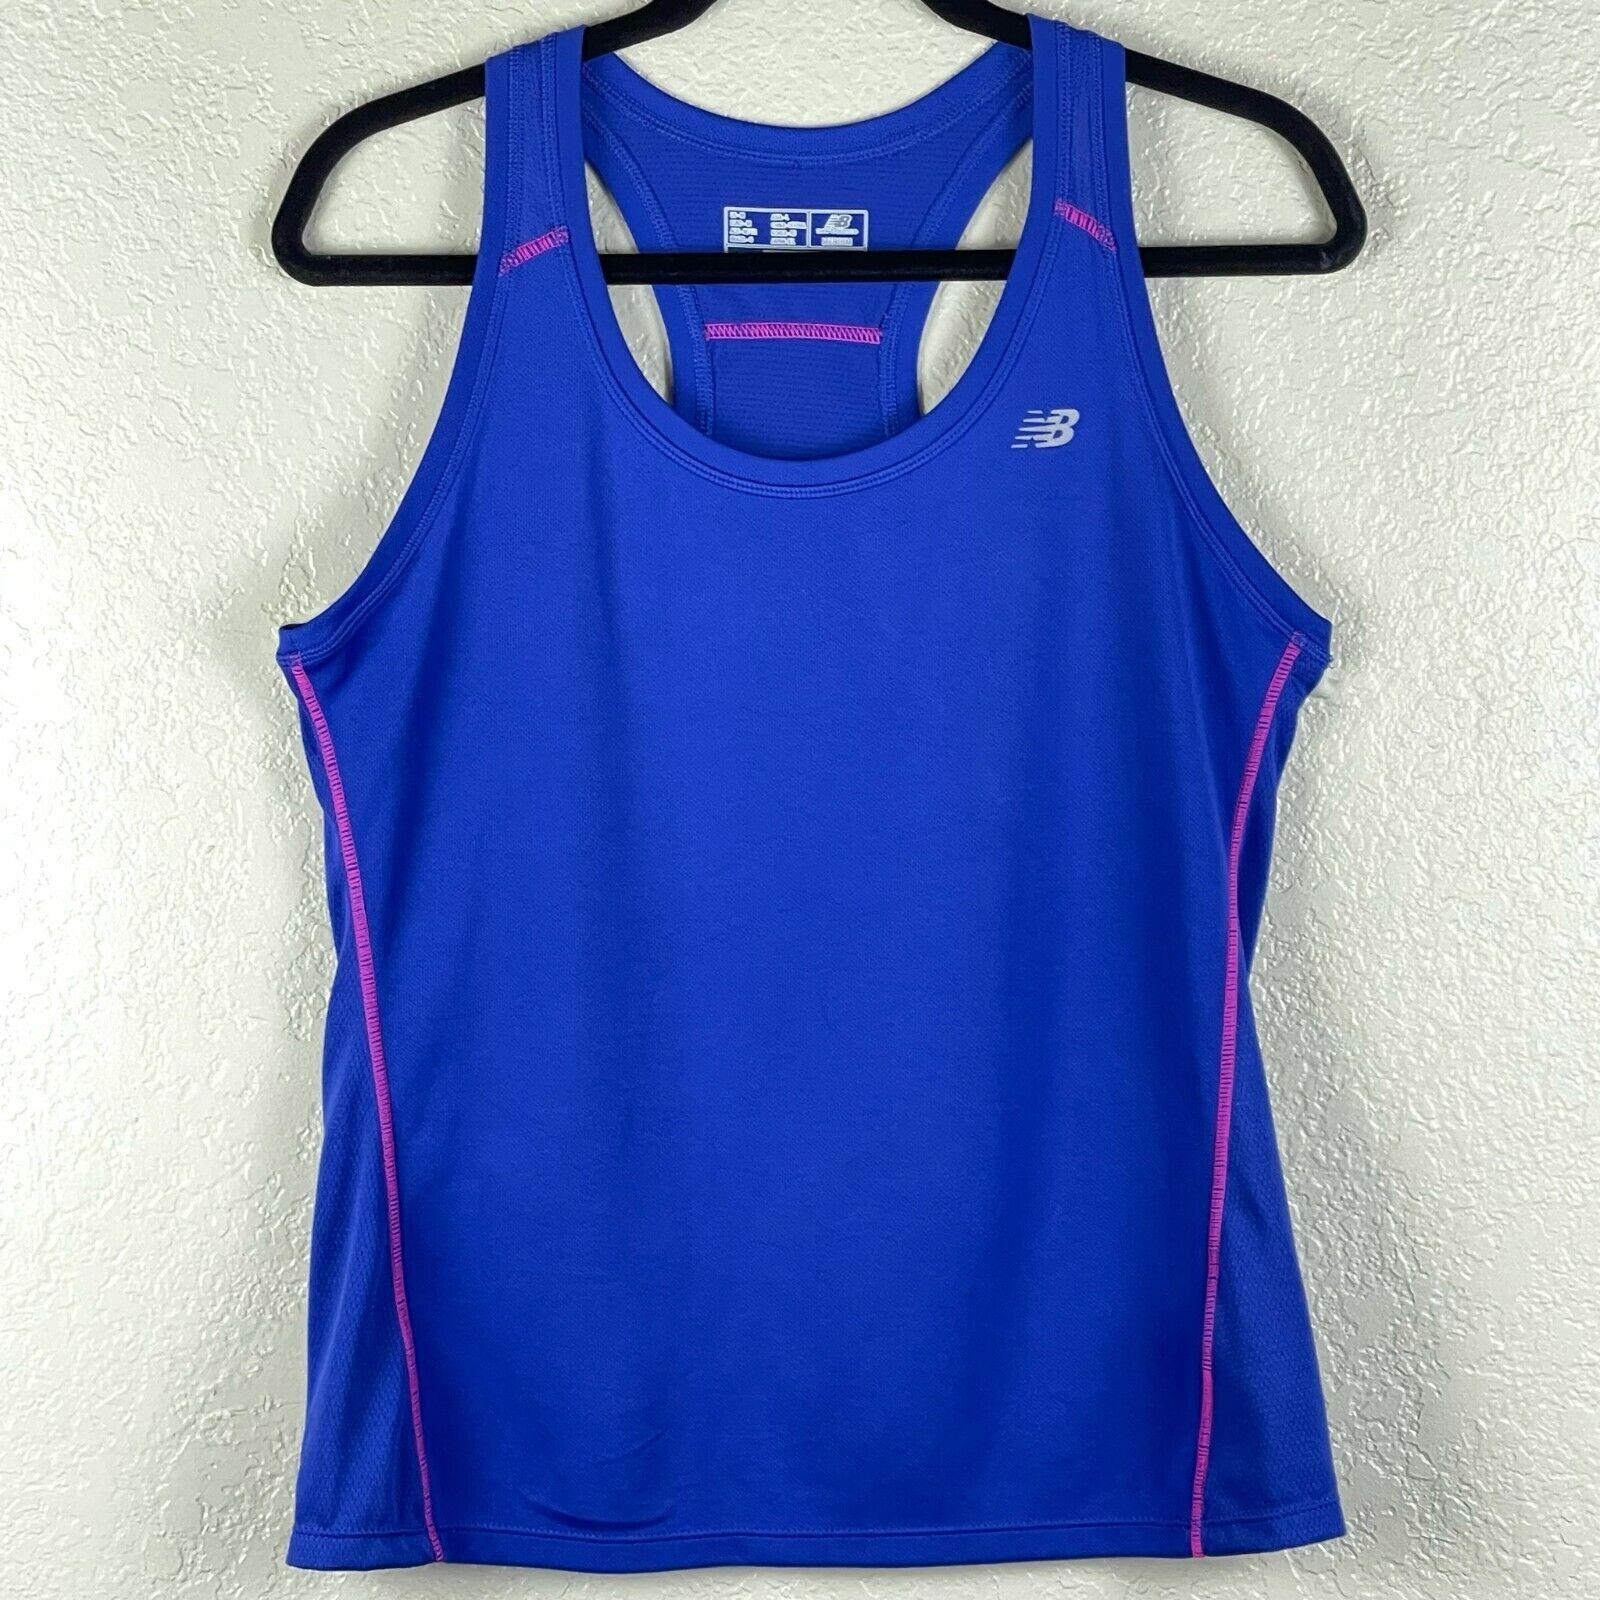 New Balance Women's Athletic Racerback Tank Top Blue Sz M LightningDry